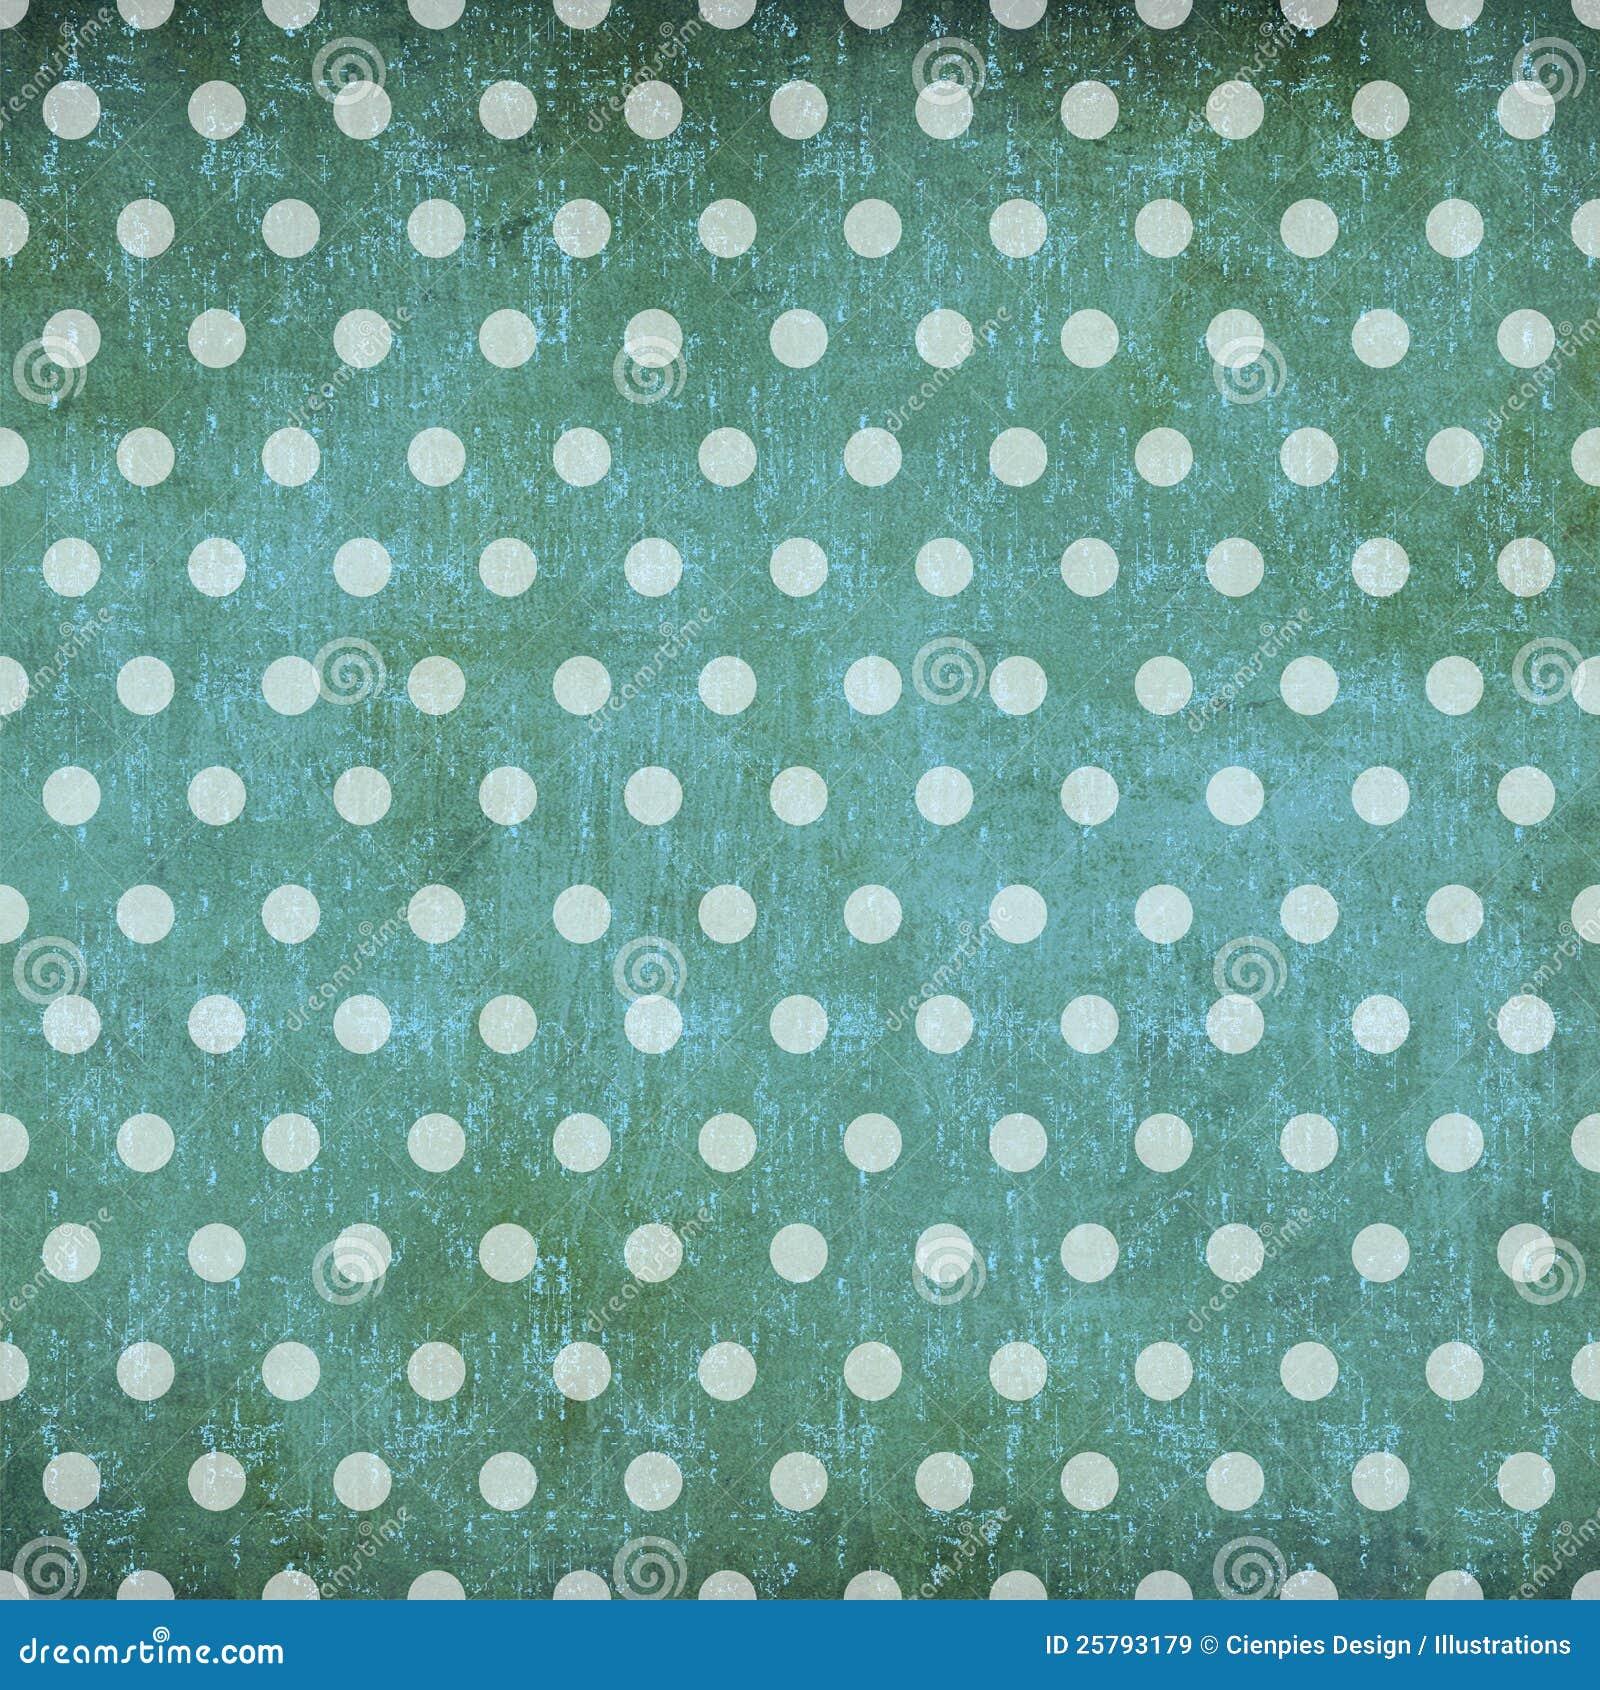 abstract polka dot vintage background stock illustration